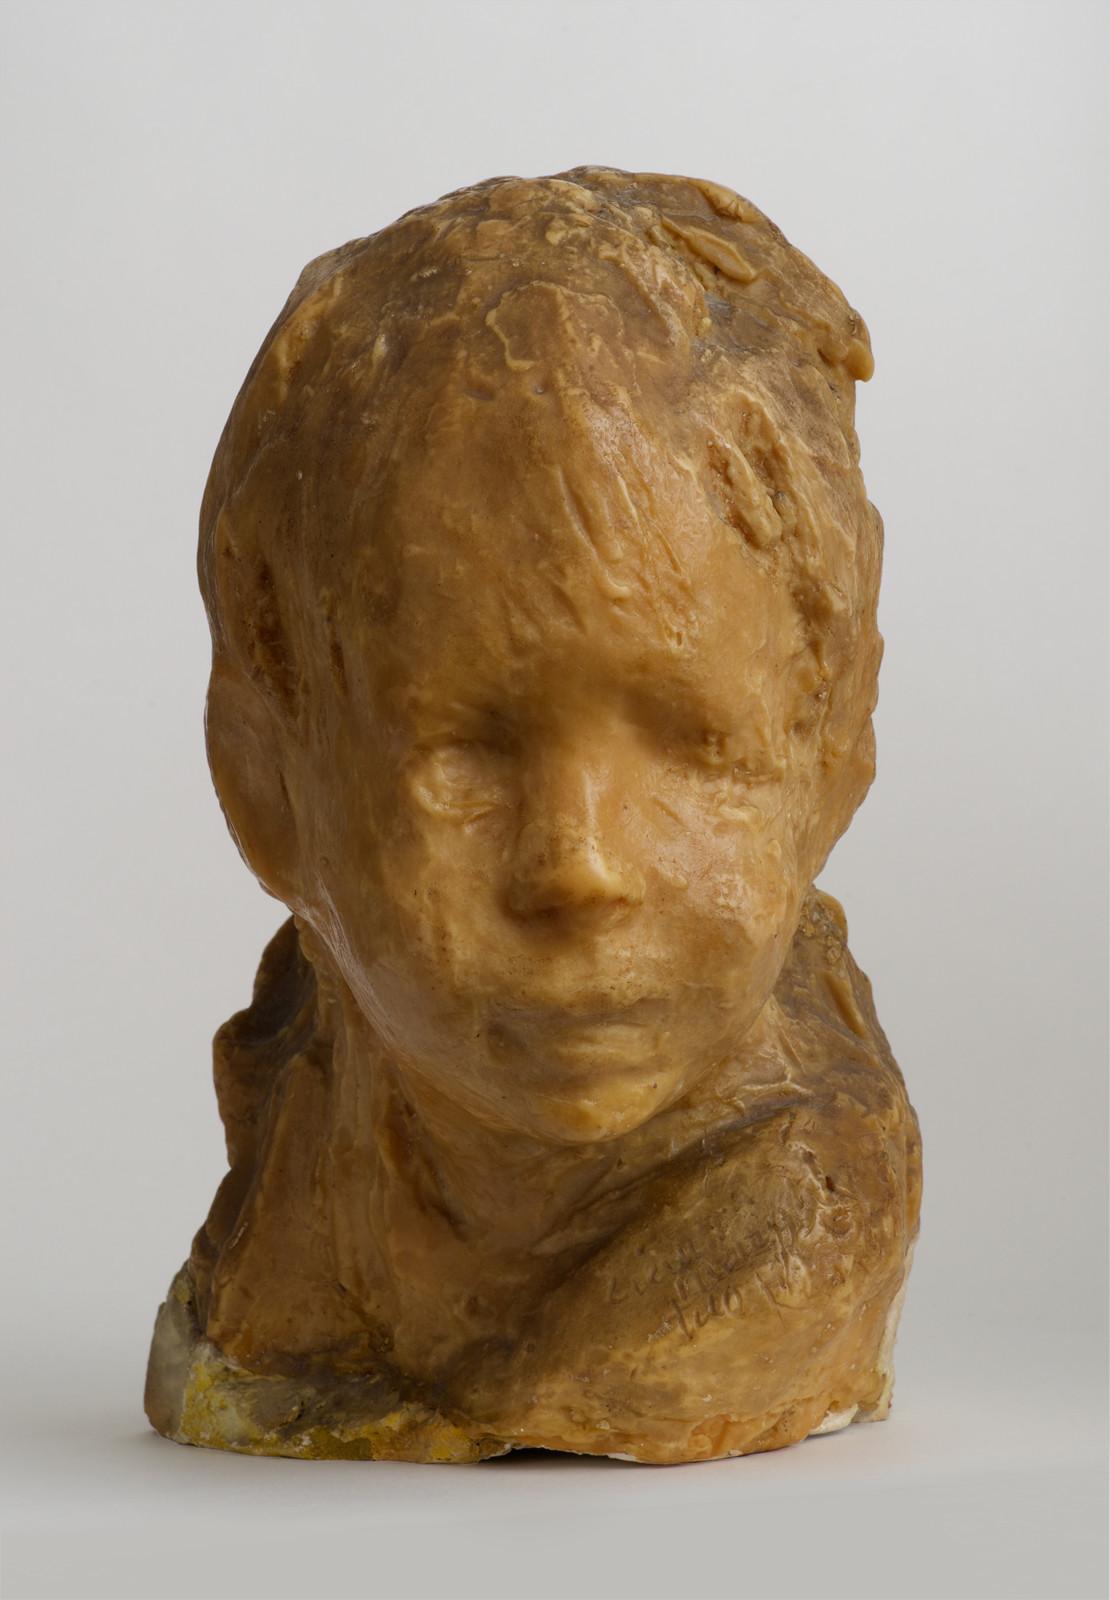 Medardo Rosso, Bambino ebreo, c. 1892-1893 / cast 1915, wax over plaster. Image courtesy of Peter Freeman, Inc., photography by Jerry Thompson.